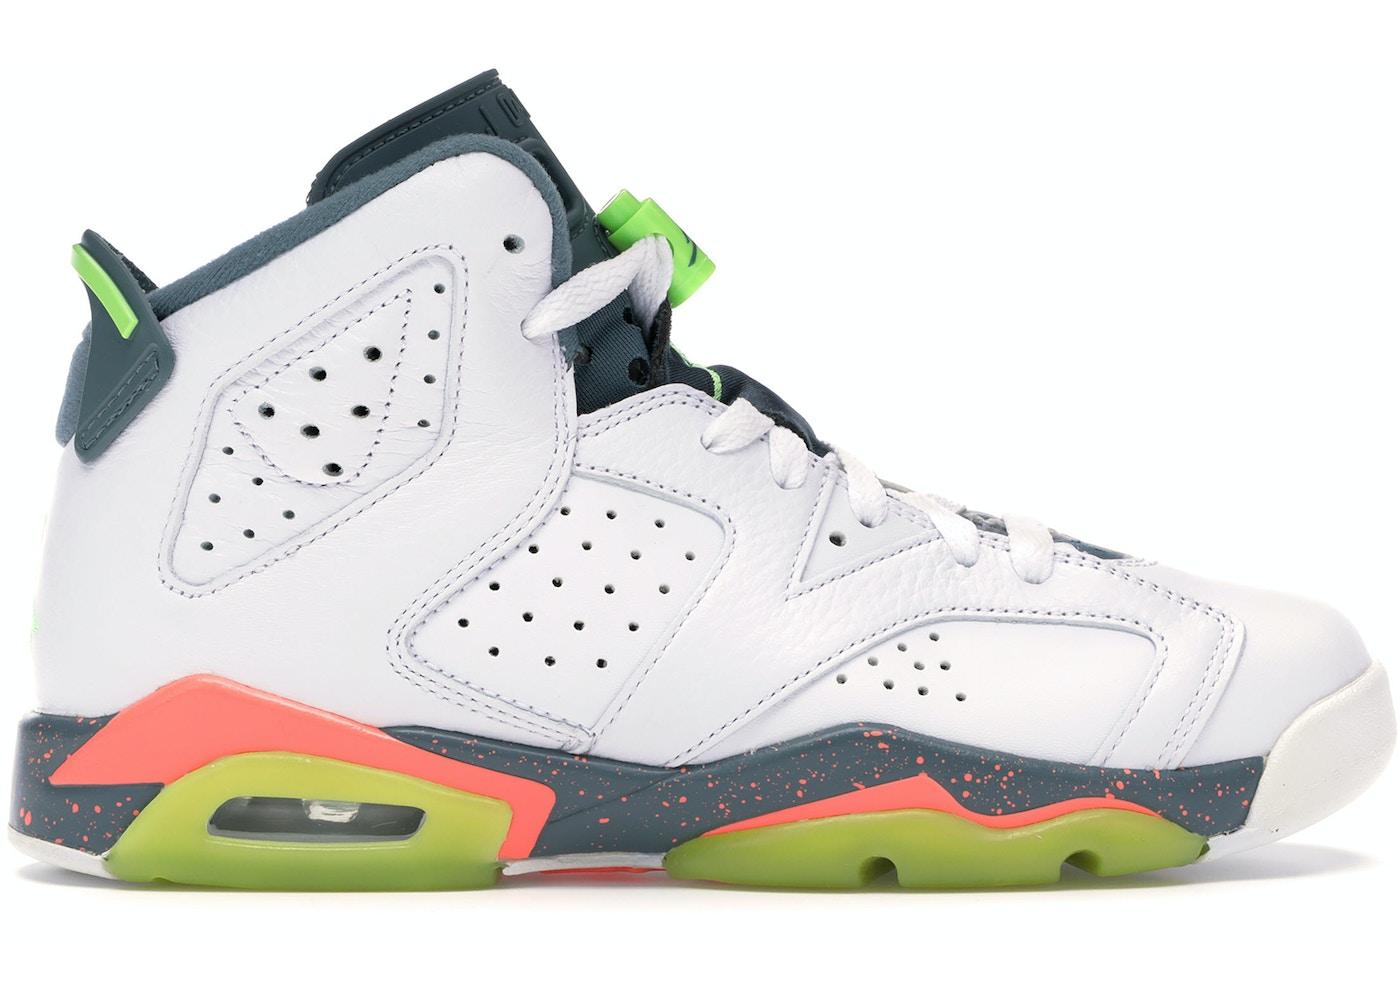 best sneakers 3bd84 45349 Jordan 6 Retro Bright Mango (GS) - 384665-114